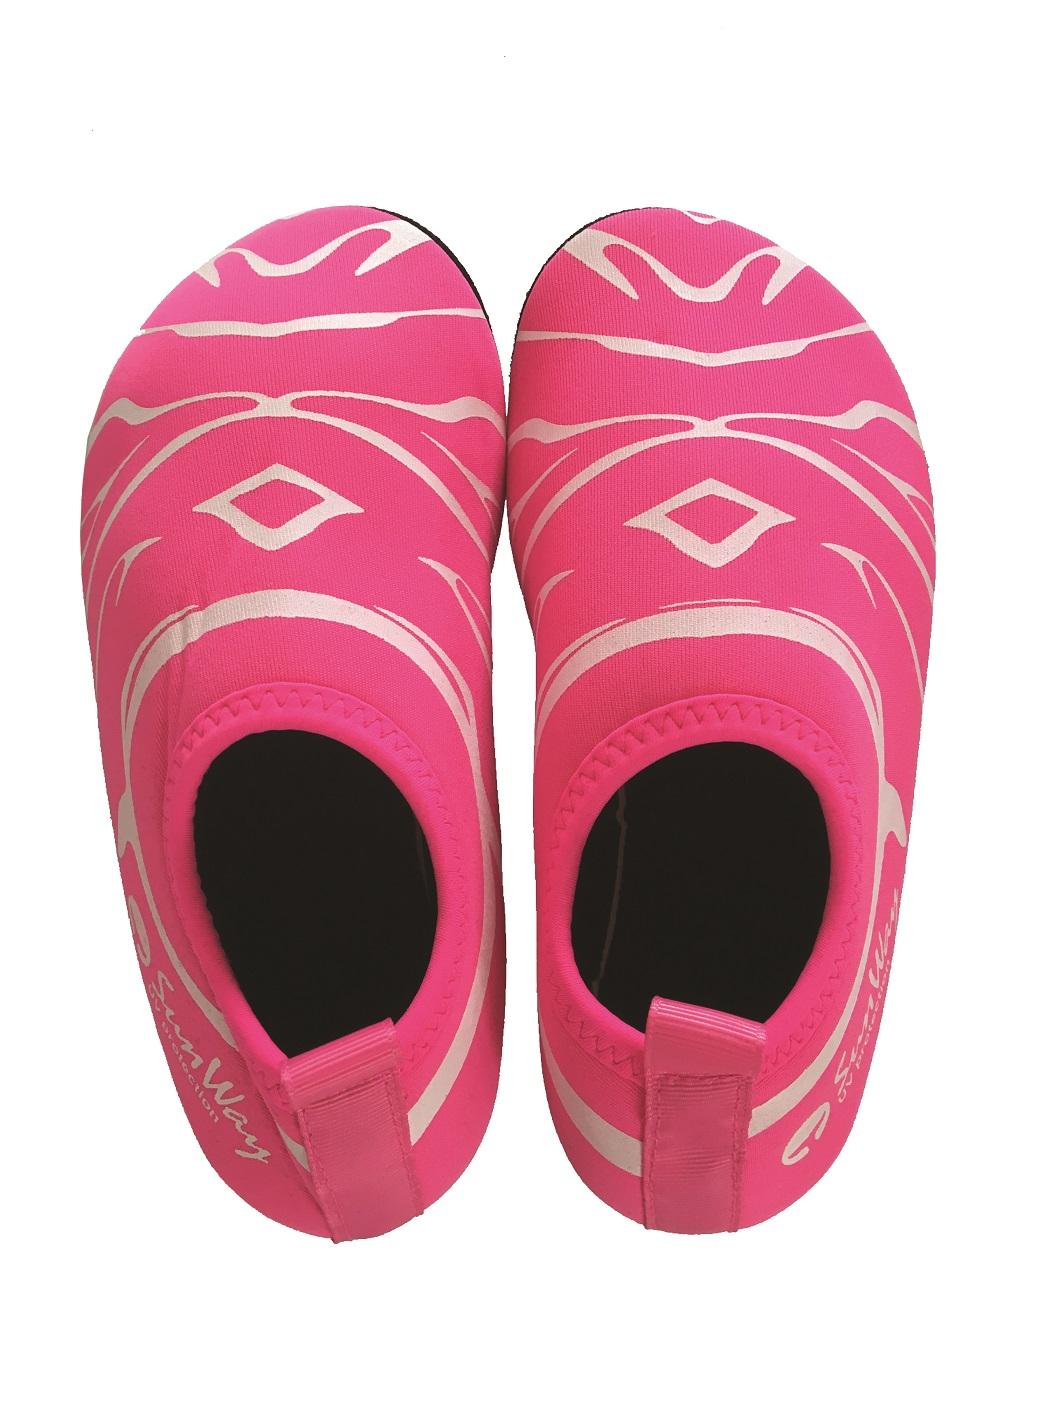 Neoprane shoes